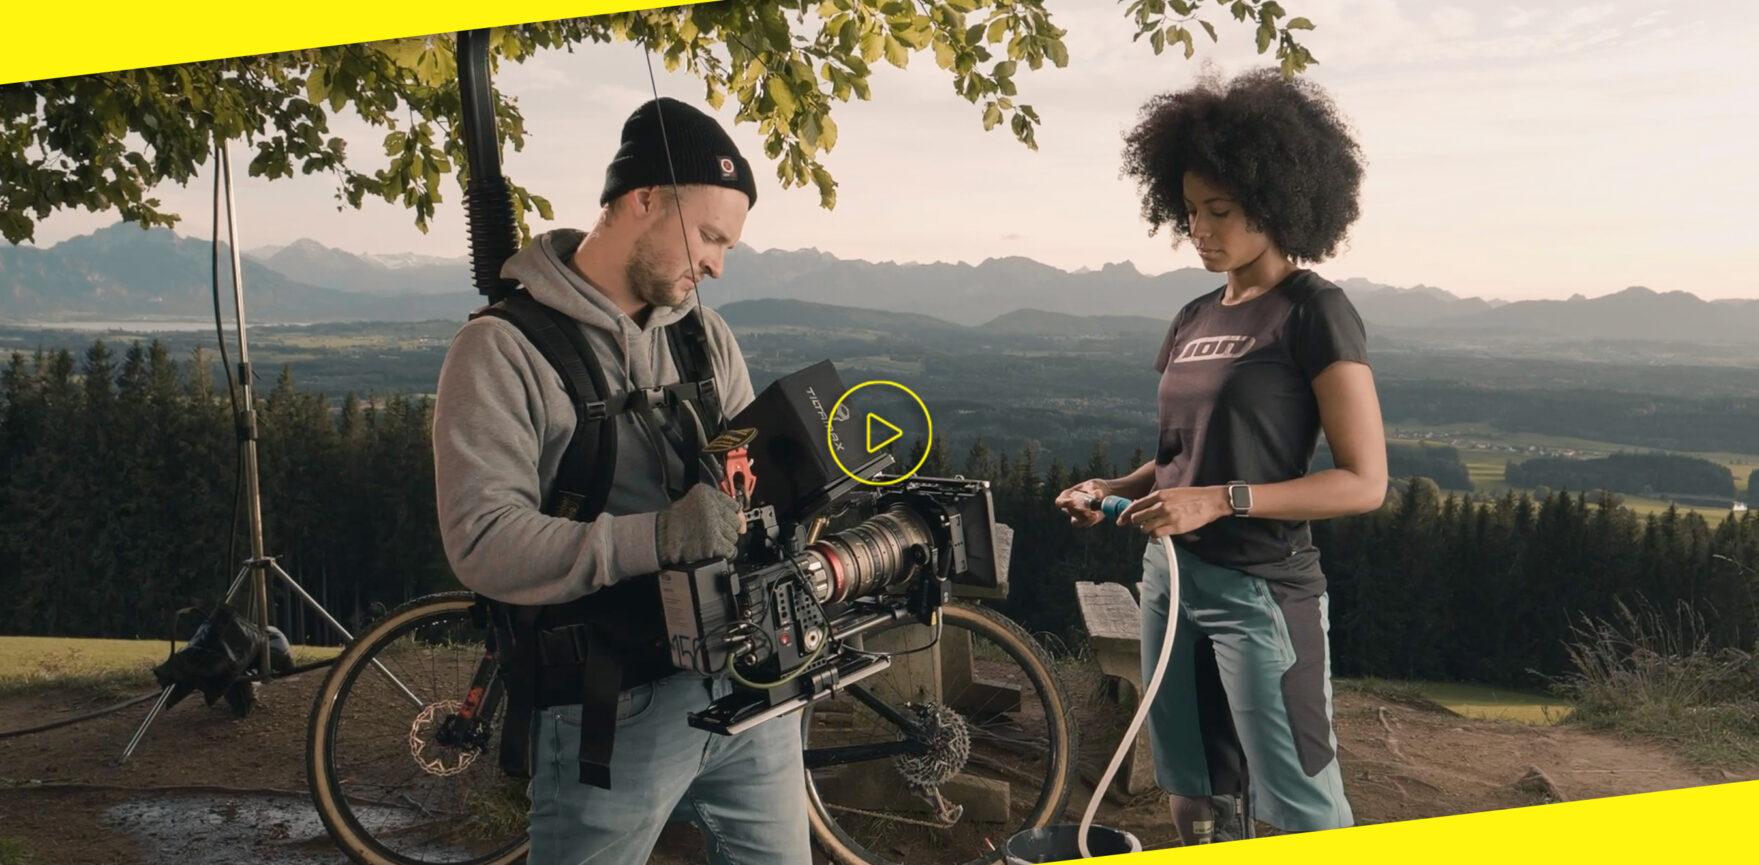 GLORIA MultiJet TVC Dreharbeiten Behind the Scenes Kameramann und Darstellerin